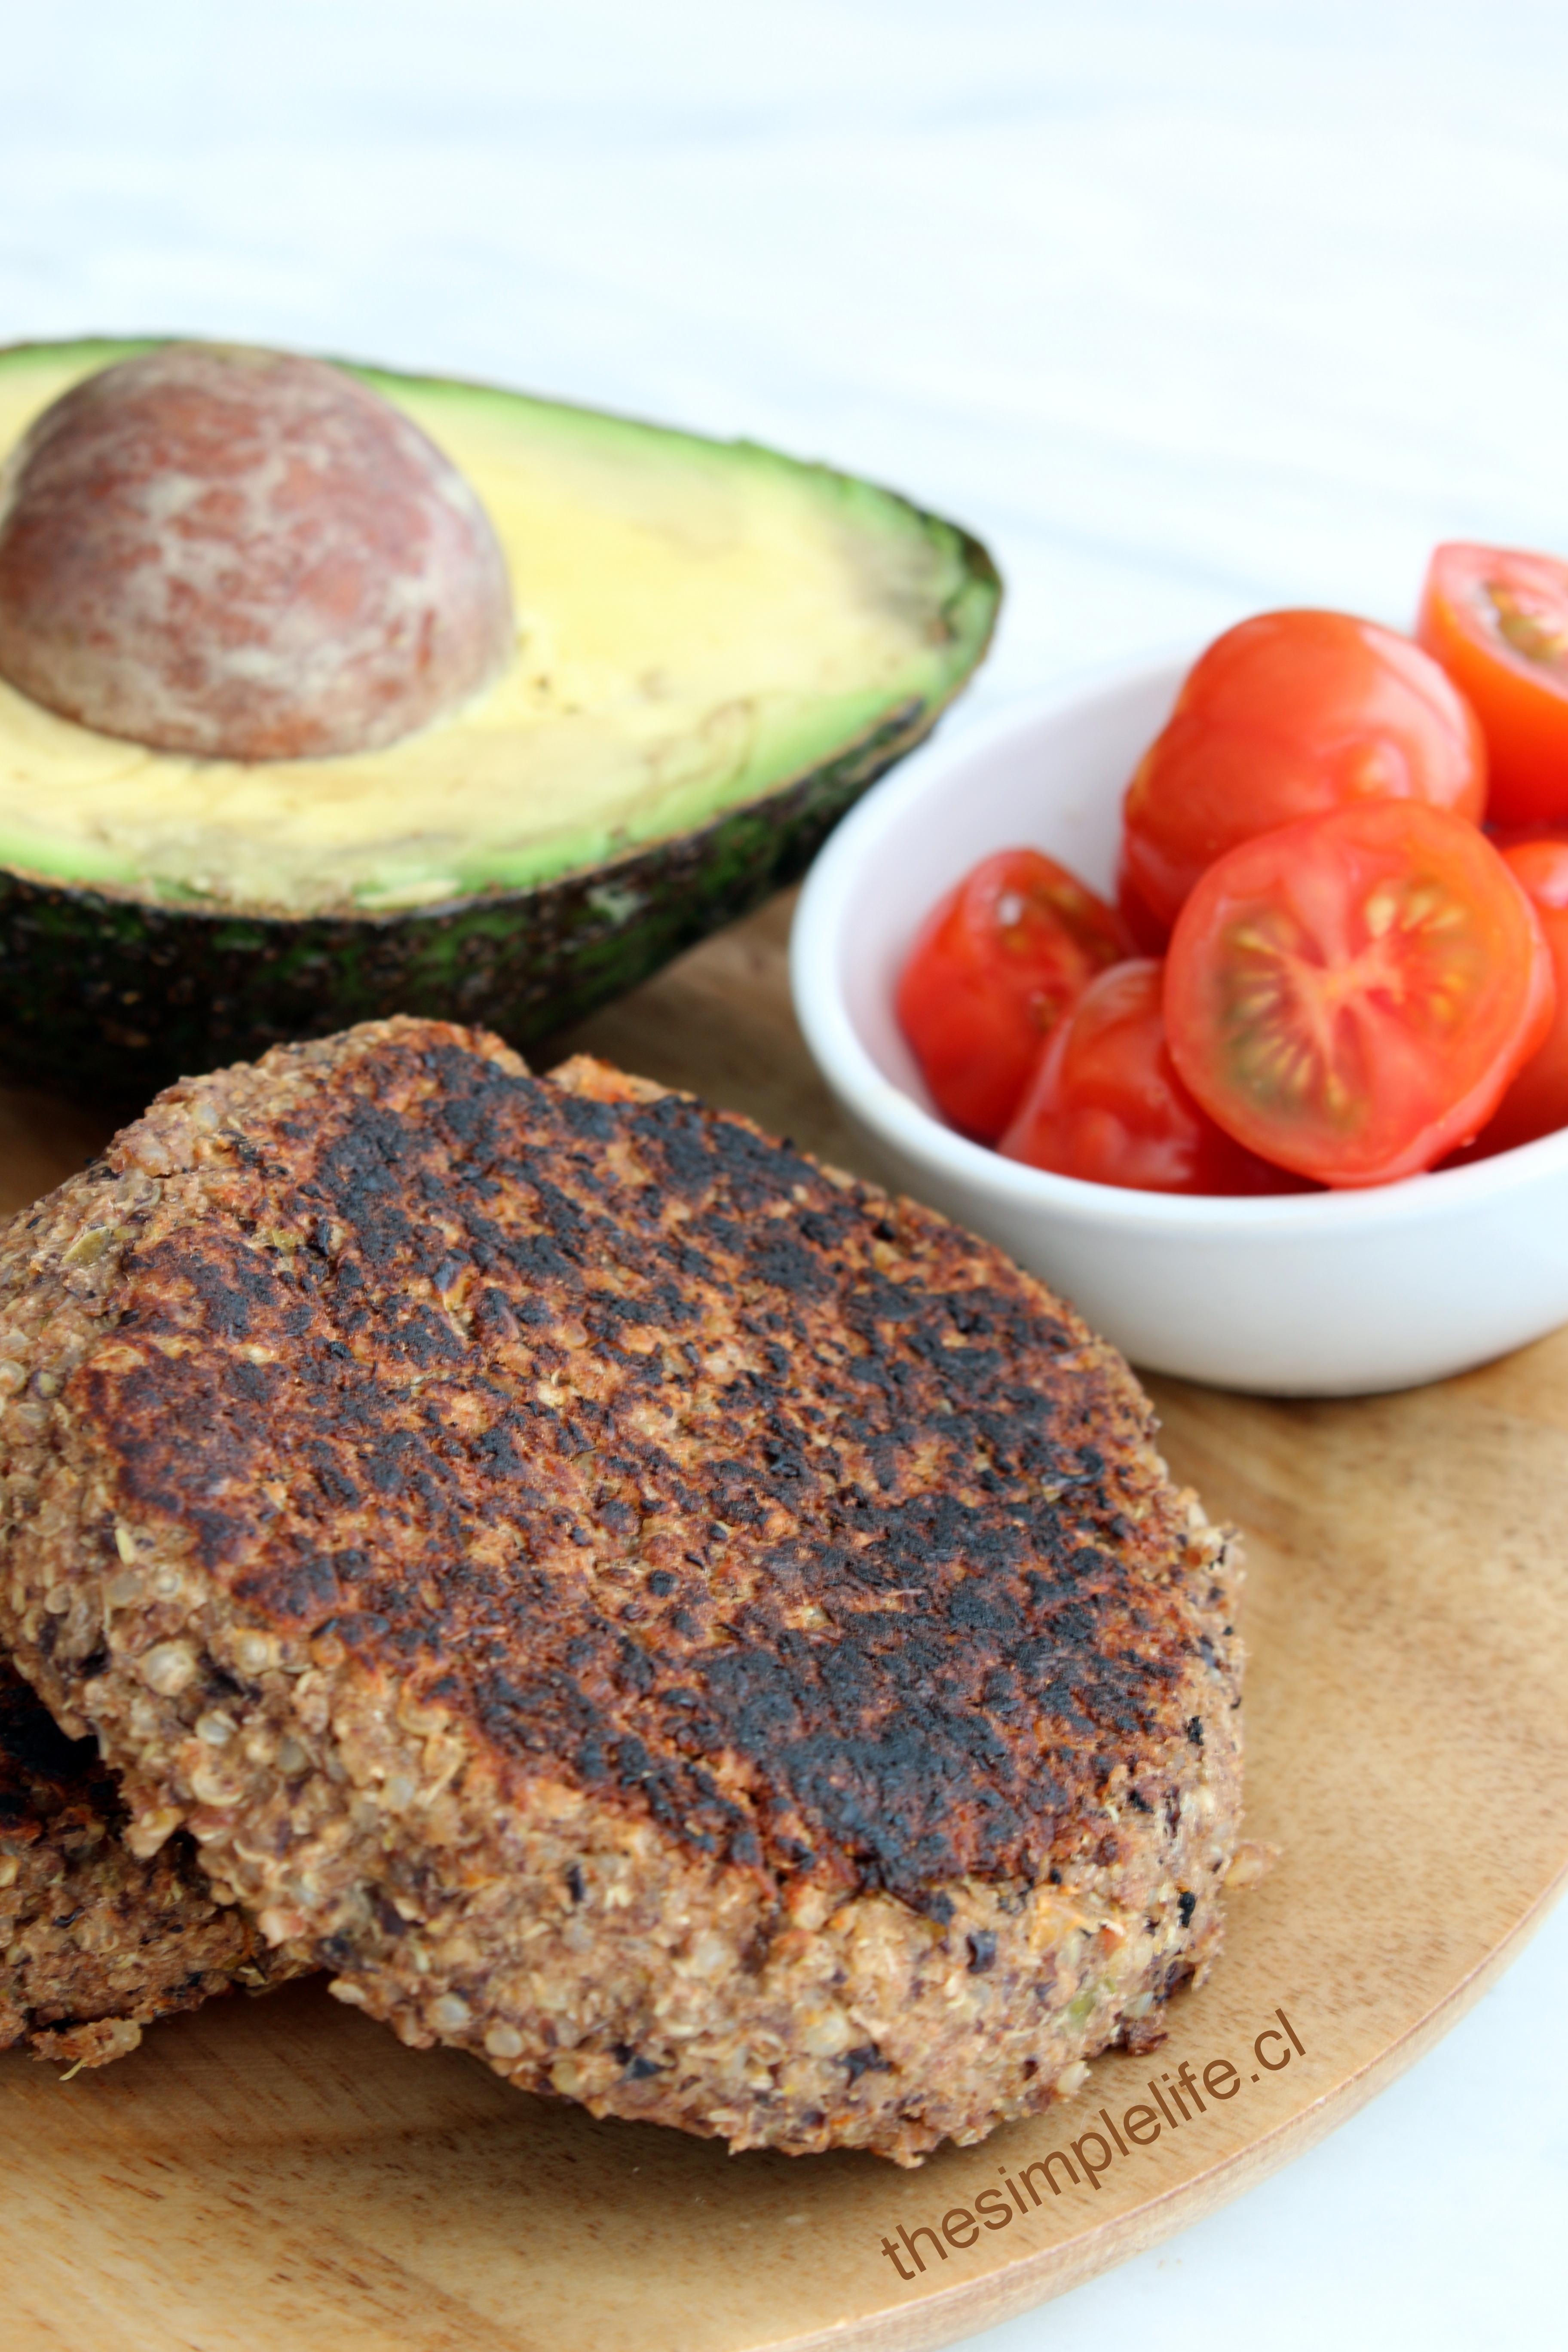 Hamburguesas de qu noa y porotos negros the simple life for Cocinar 1 taza de quinoa